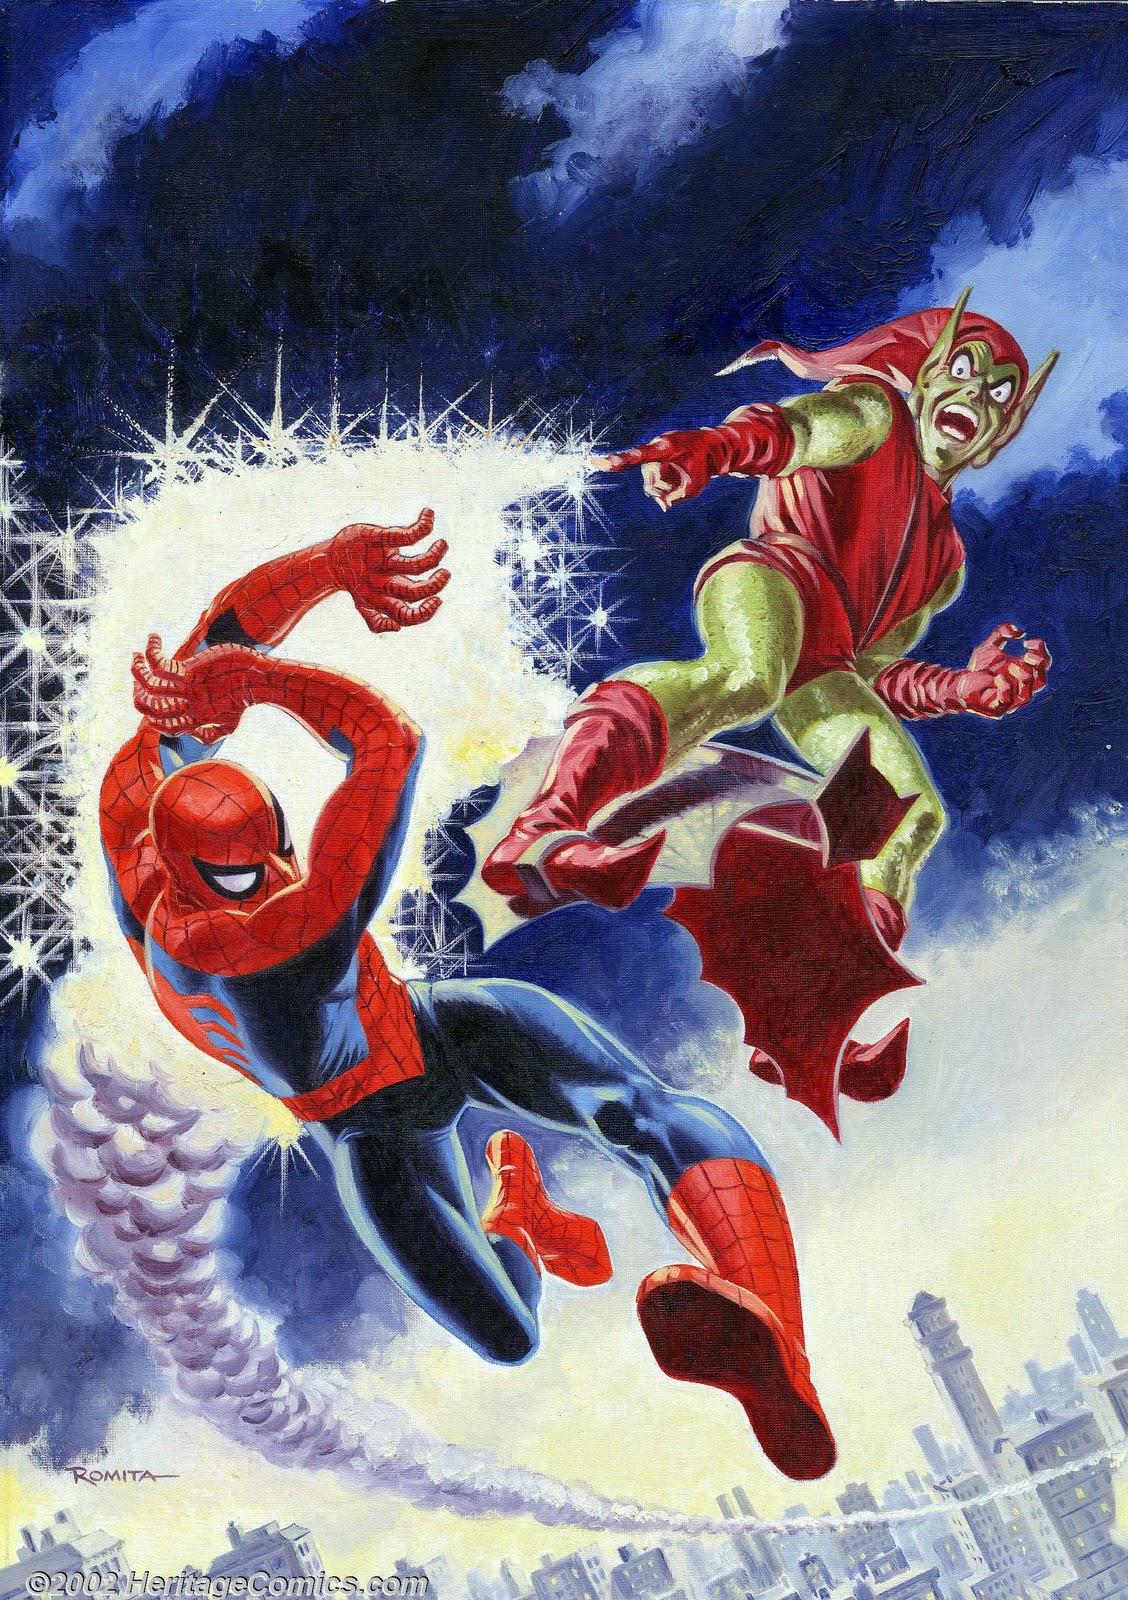 Original Art Stories John Romita Marvel Giant Nuff Said